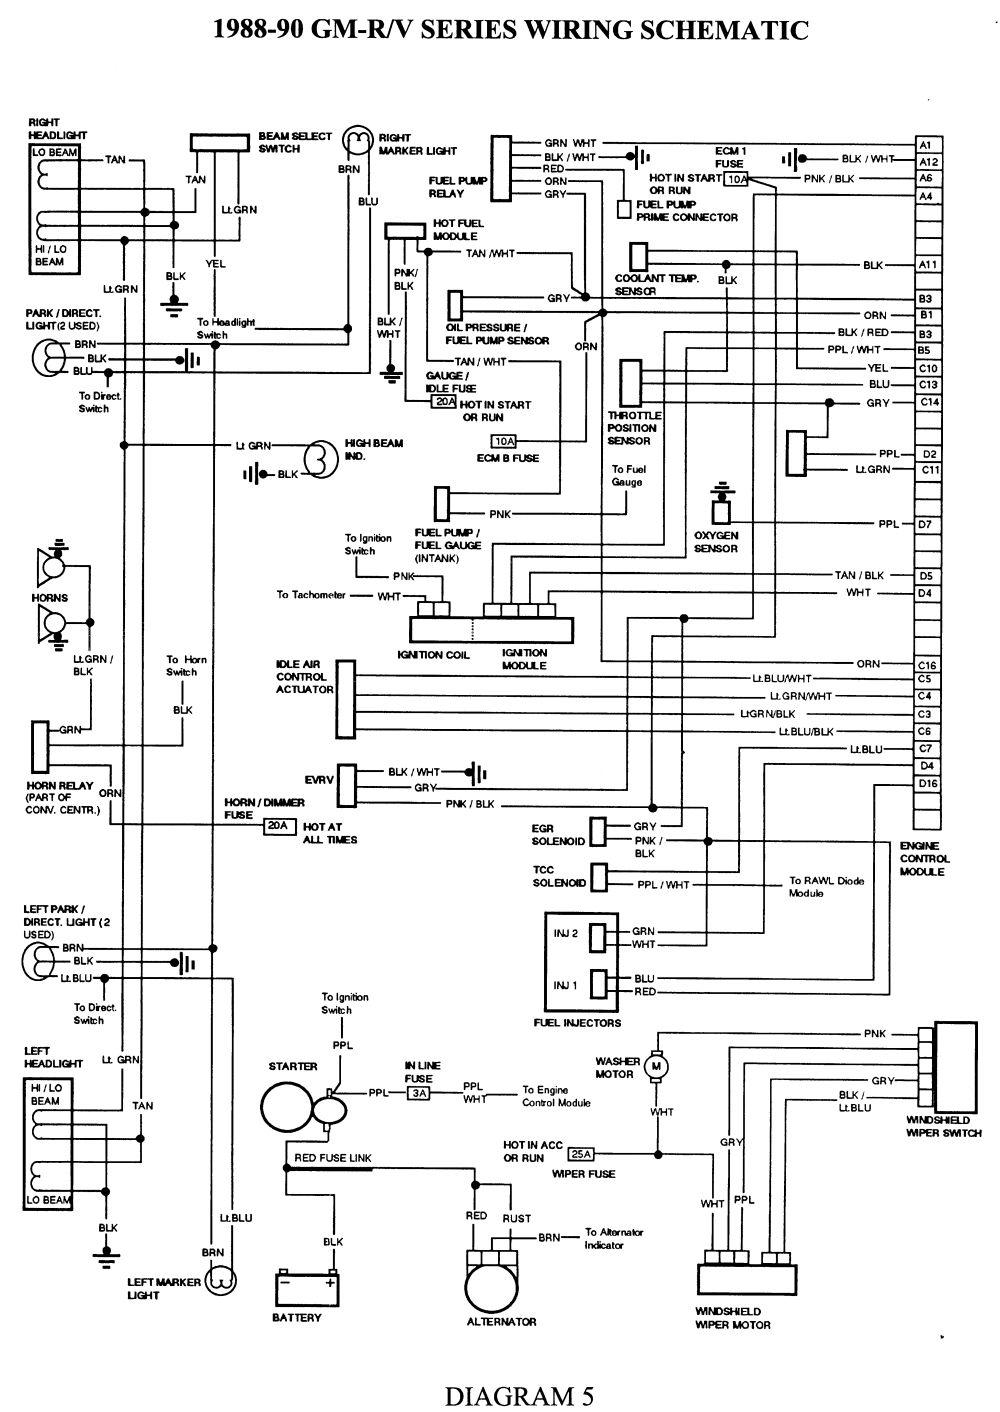 89 Geo Metro Headlight Wiring Diagram